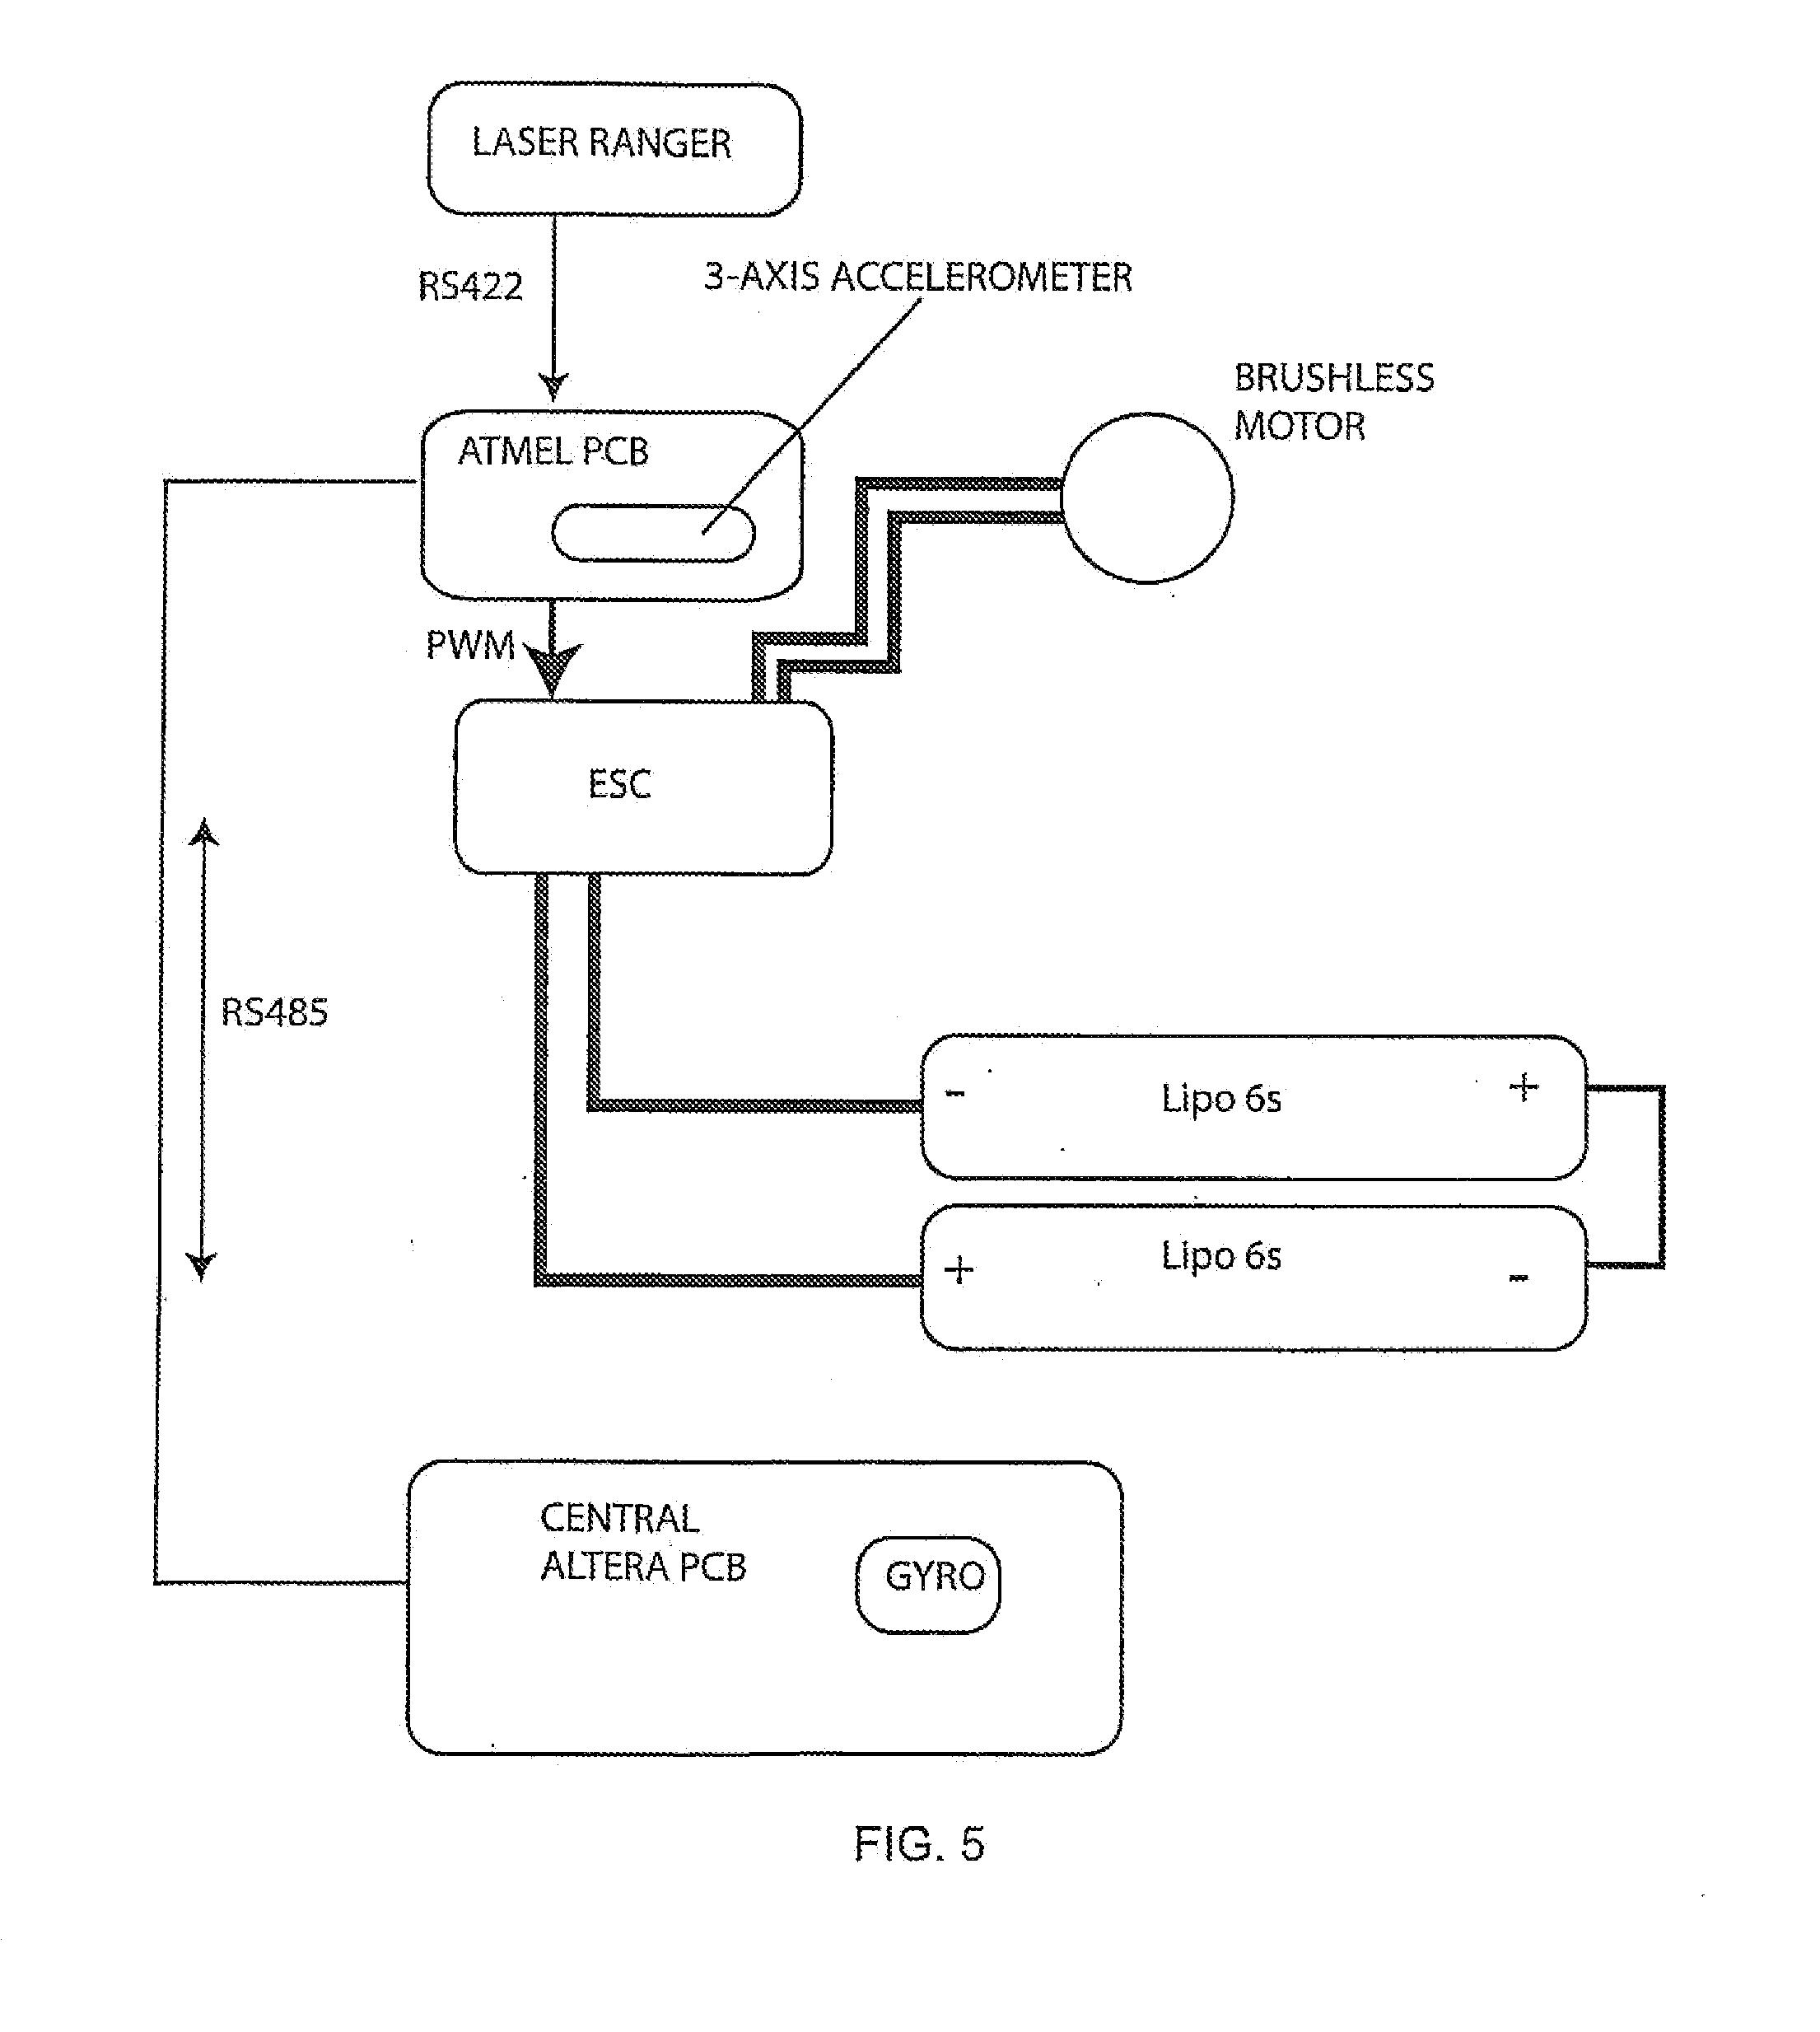 Ricon S Series Wiring Diagram Schematics. Ricon Wiring Diagrams Schematic S Series Diagram. Wiring. Ricon S Series Wiring Diagram 1231 At Scoala.co